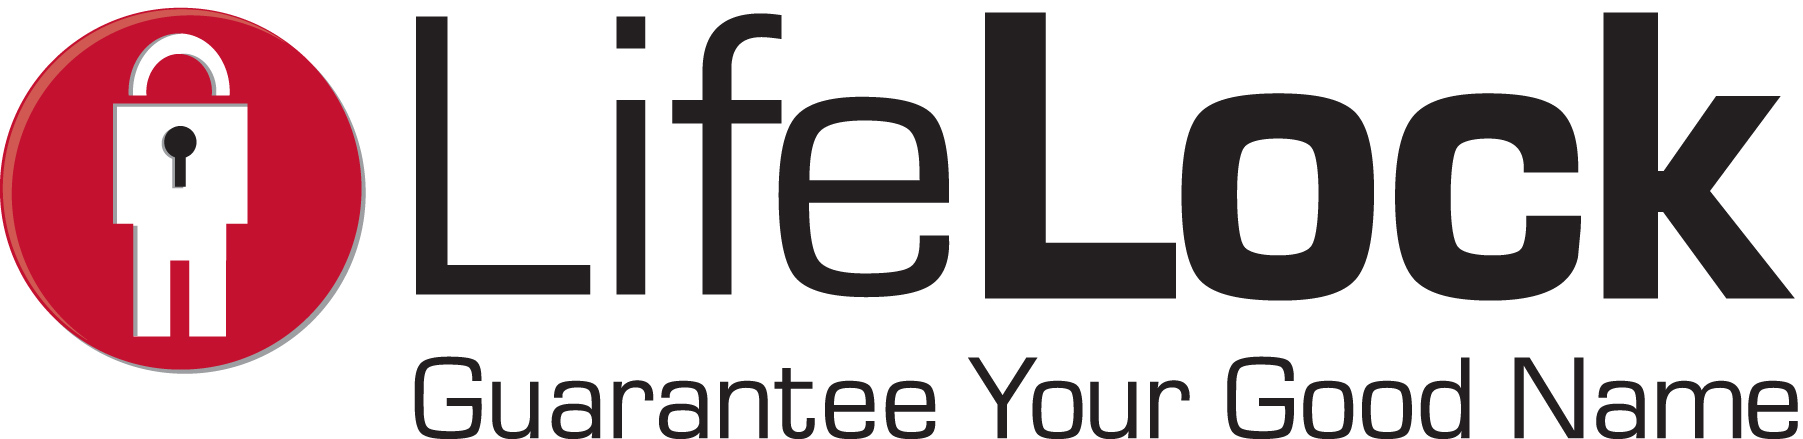 lifelock-inc-logo.jpg